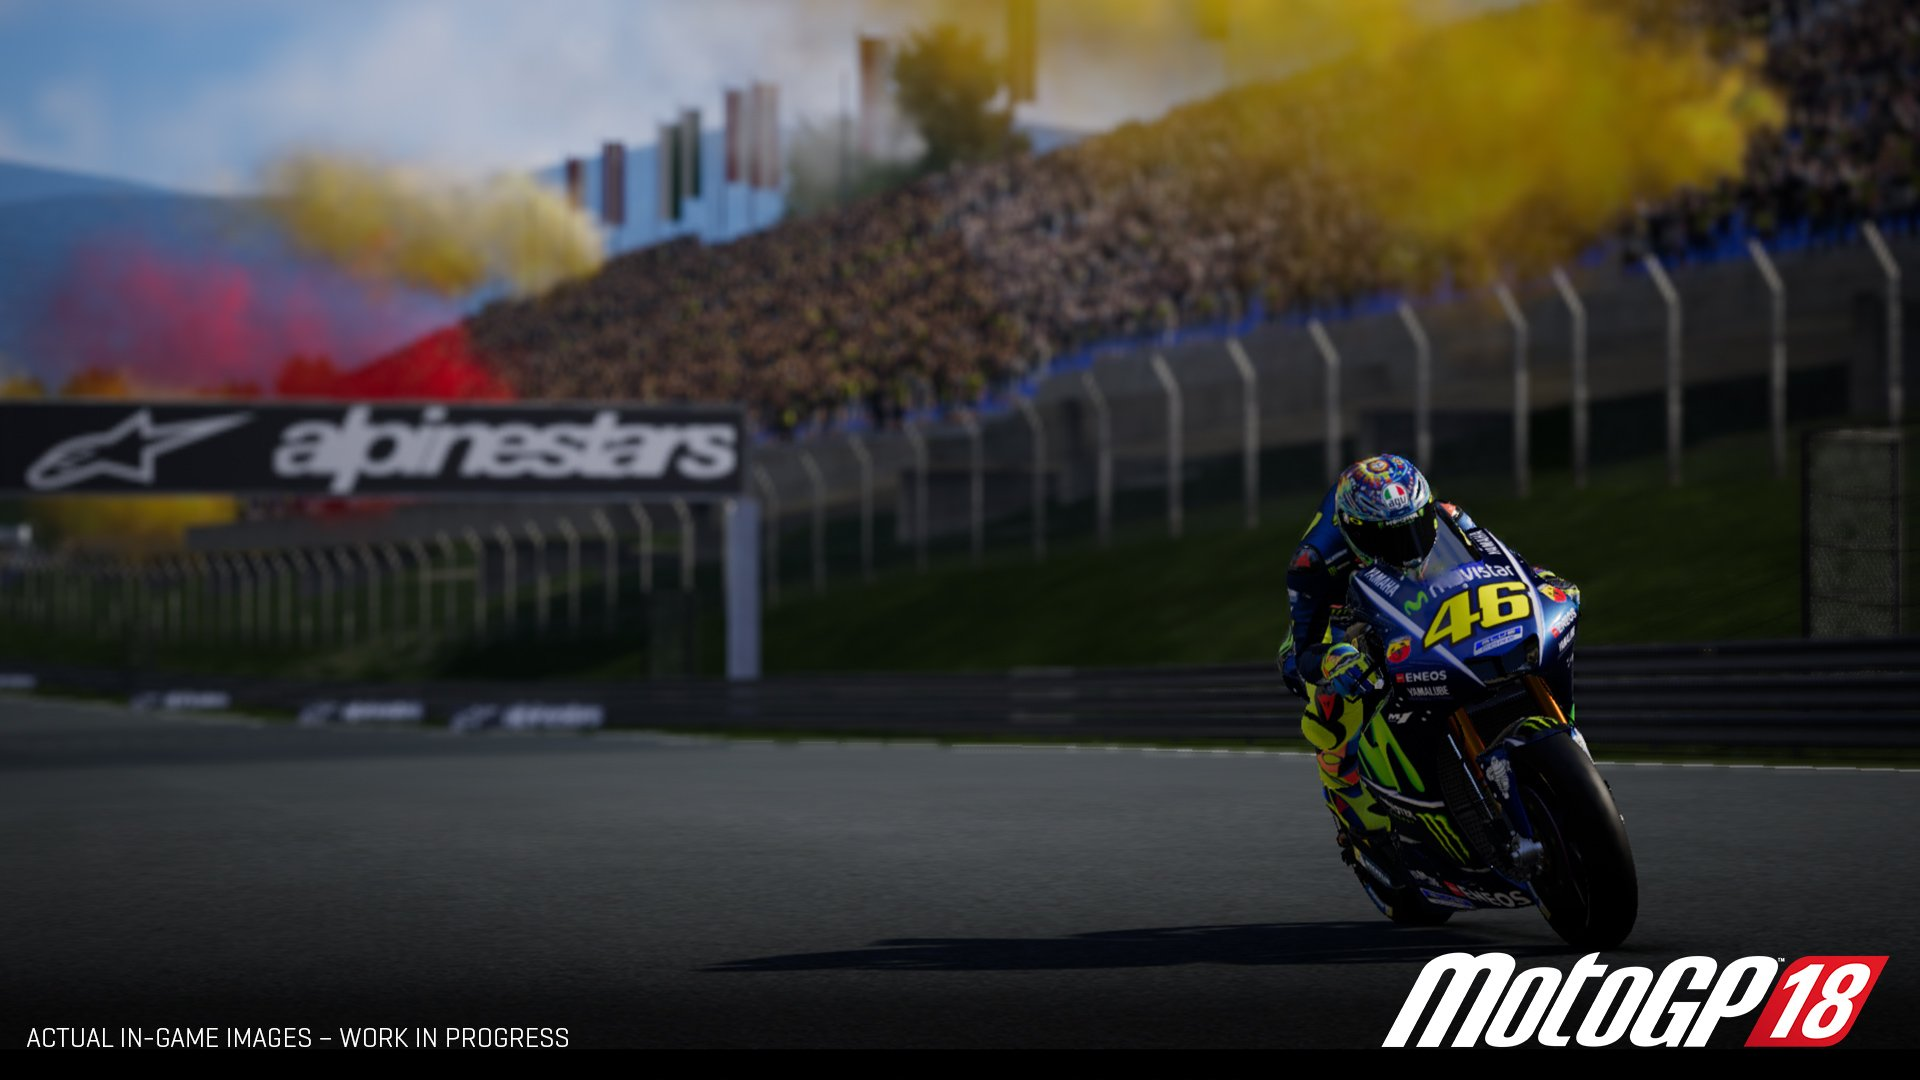 MotoGP 18 preview 3